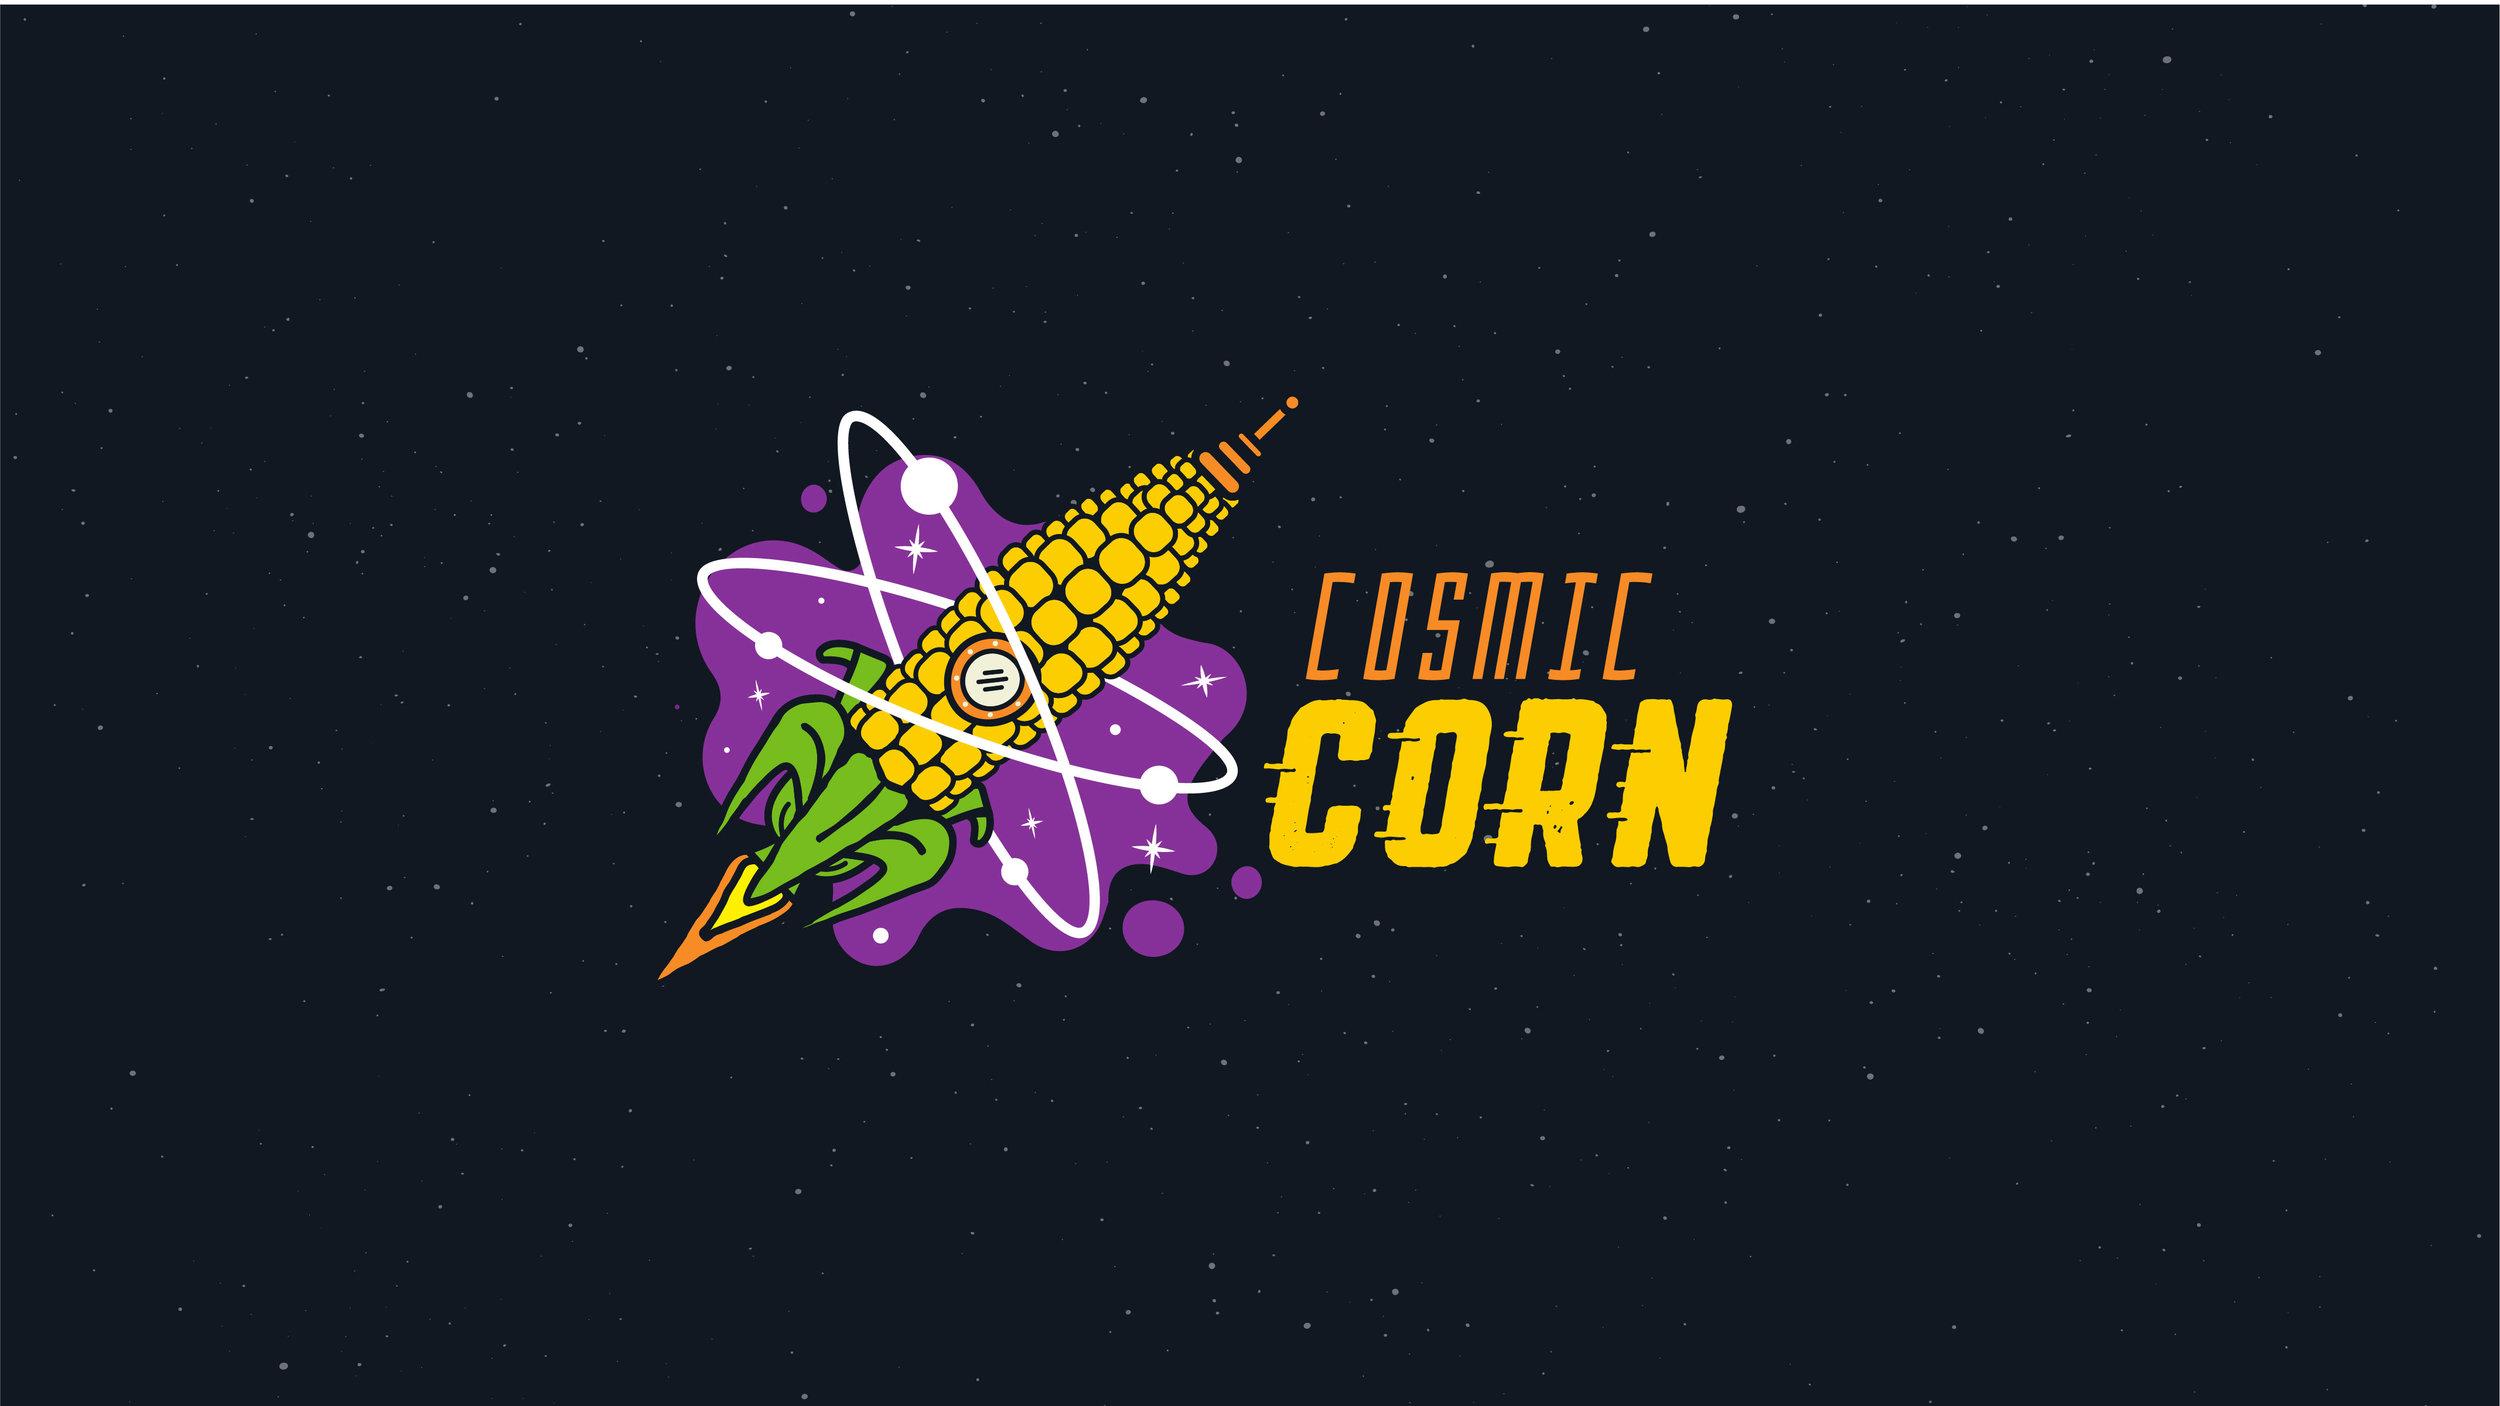 CosmicCorn_Brand_Presentation_Final-04.jpg